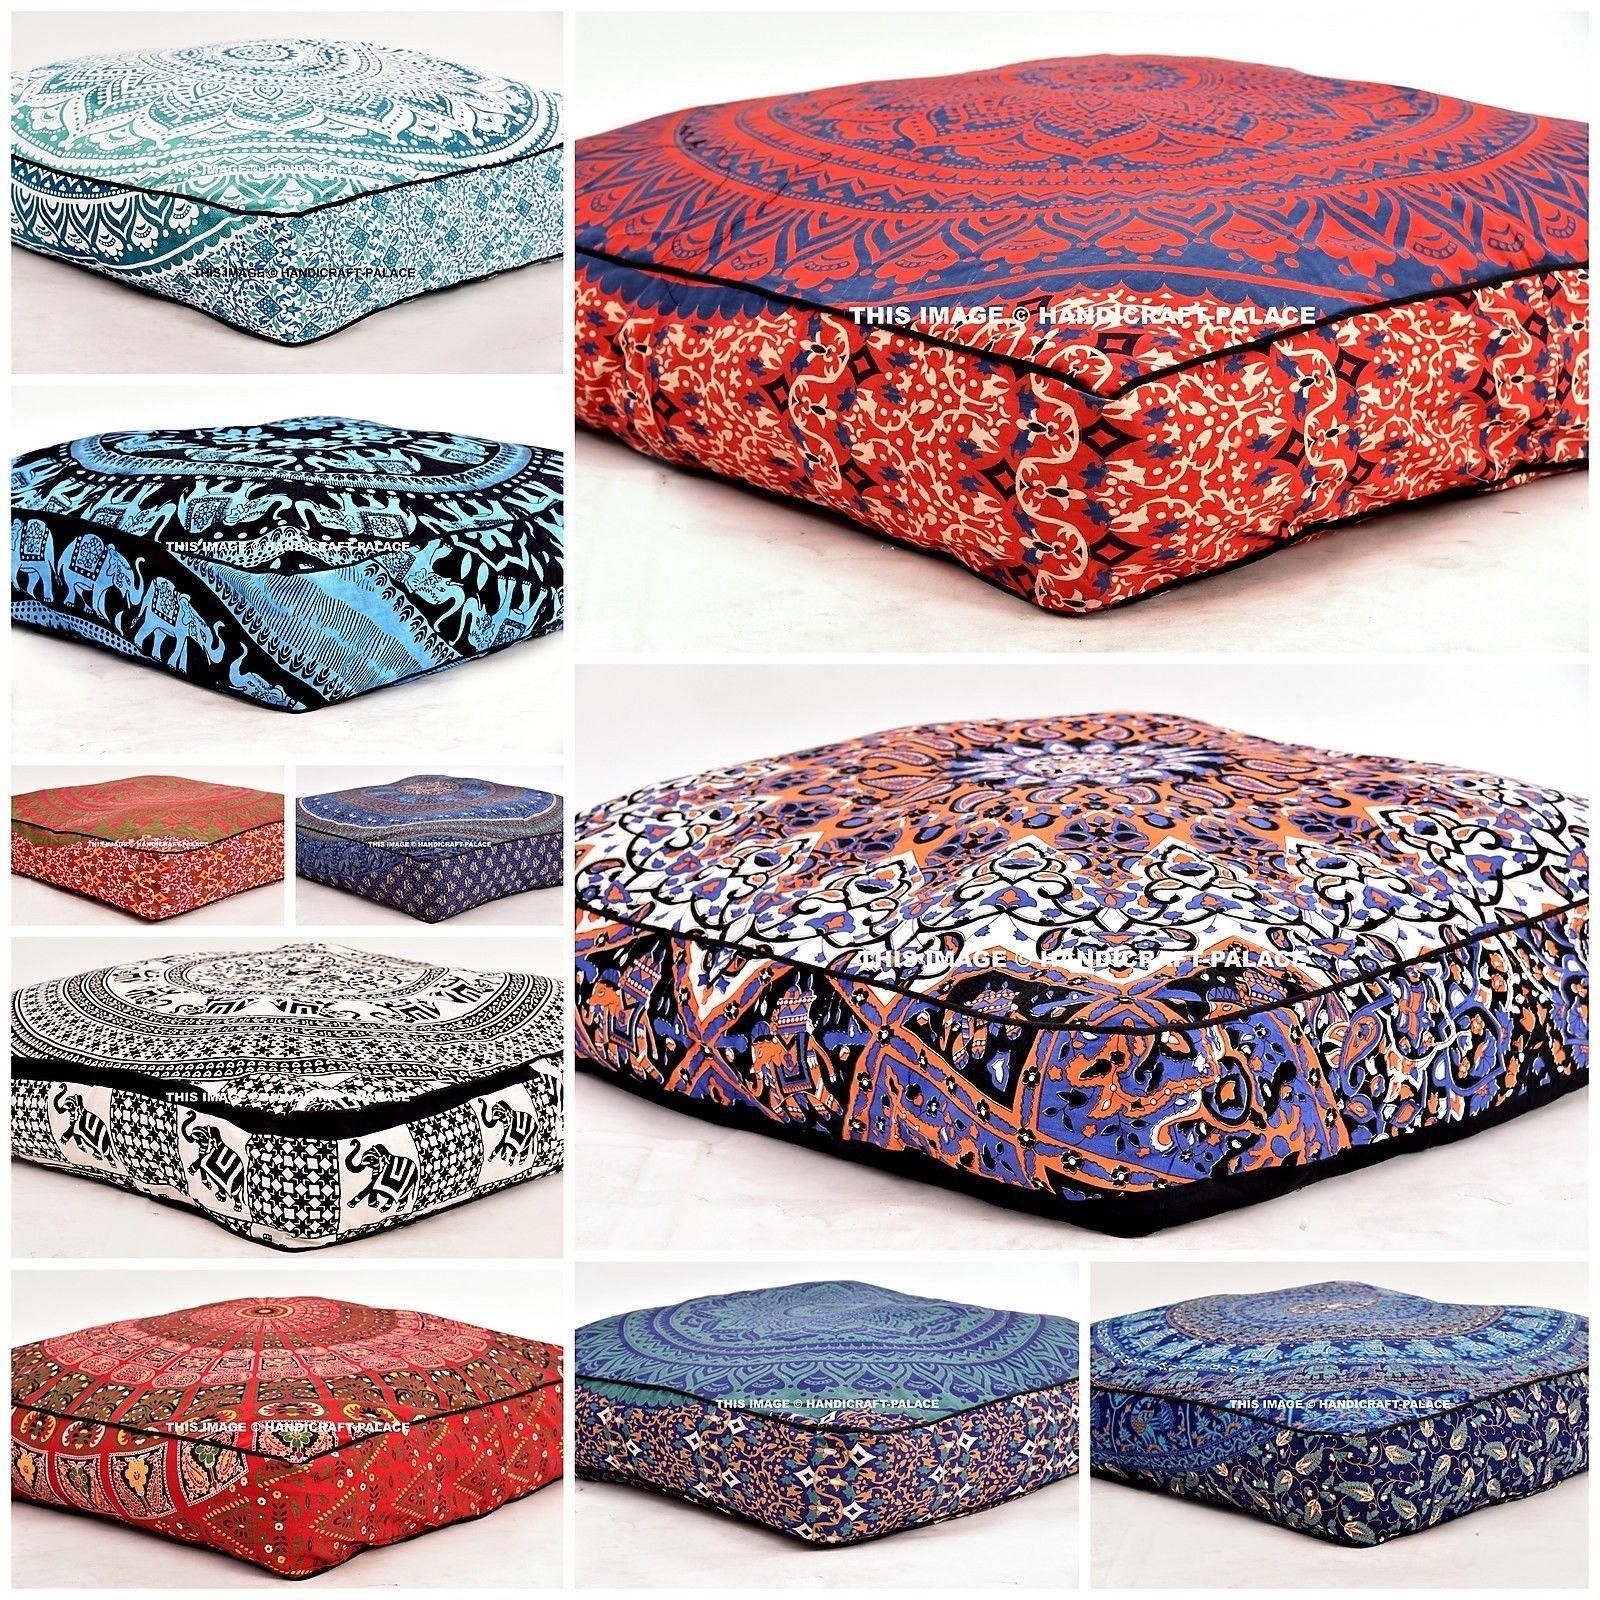 Large Indian Meditation Floor Pillow Cover 35 Mandala Ottoman Cushion Dog Bed Floor Pillows Large Floor Pillows Decorative Floor Cushions